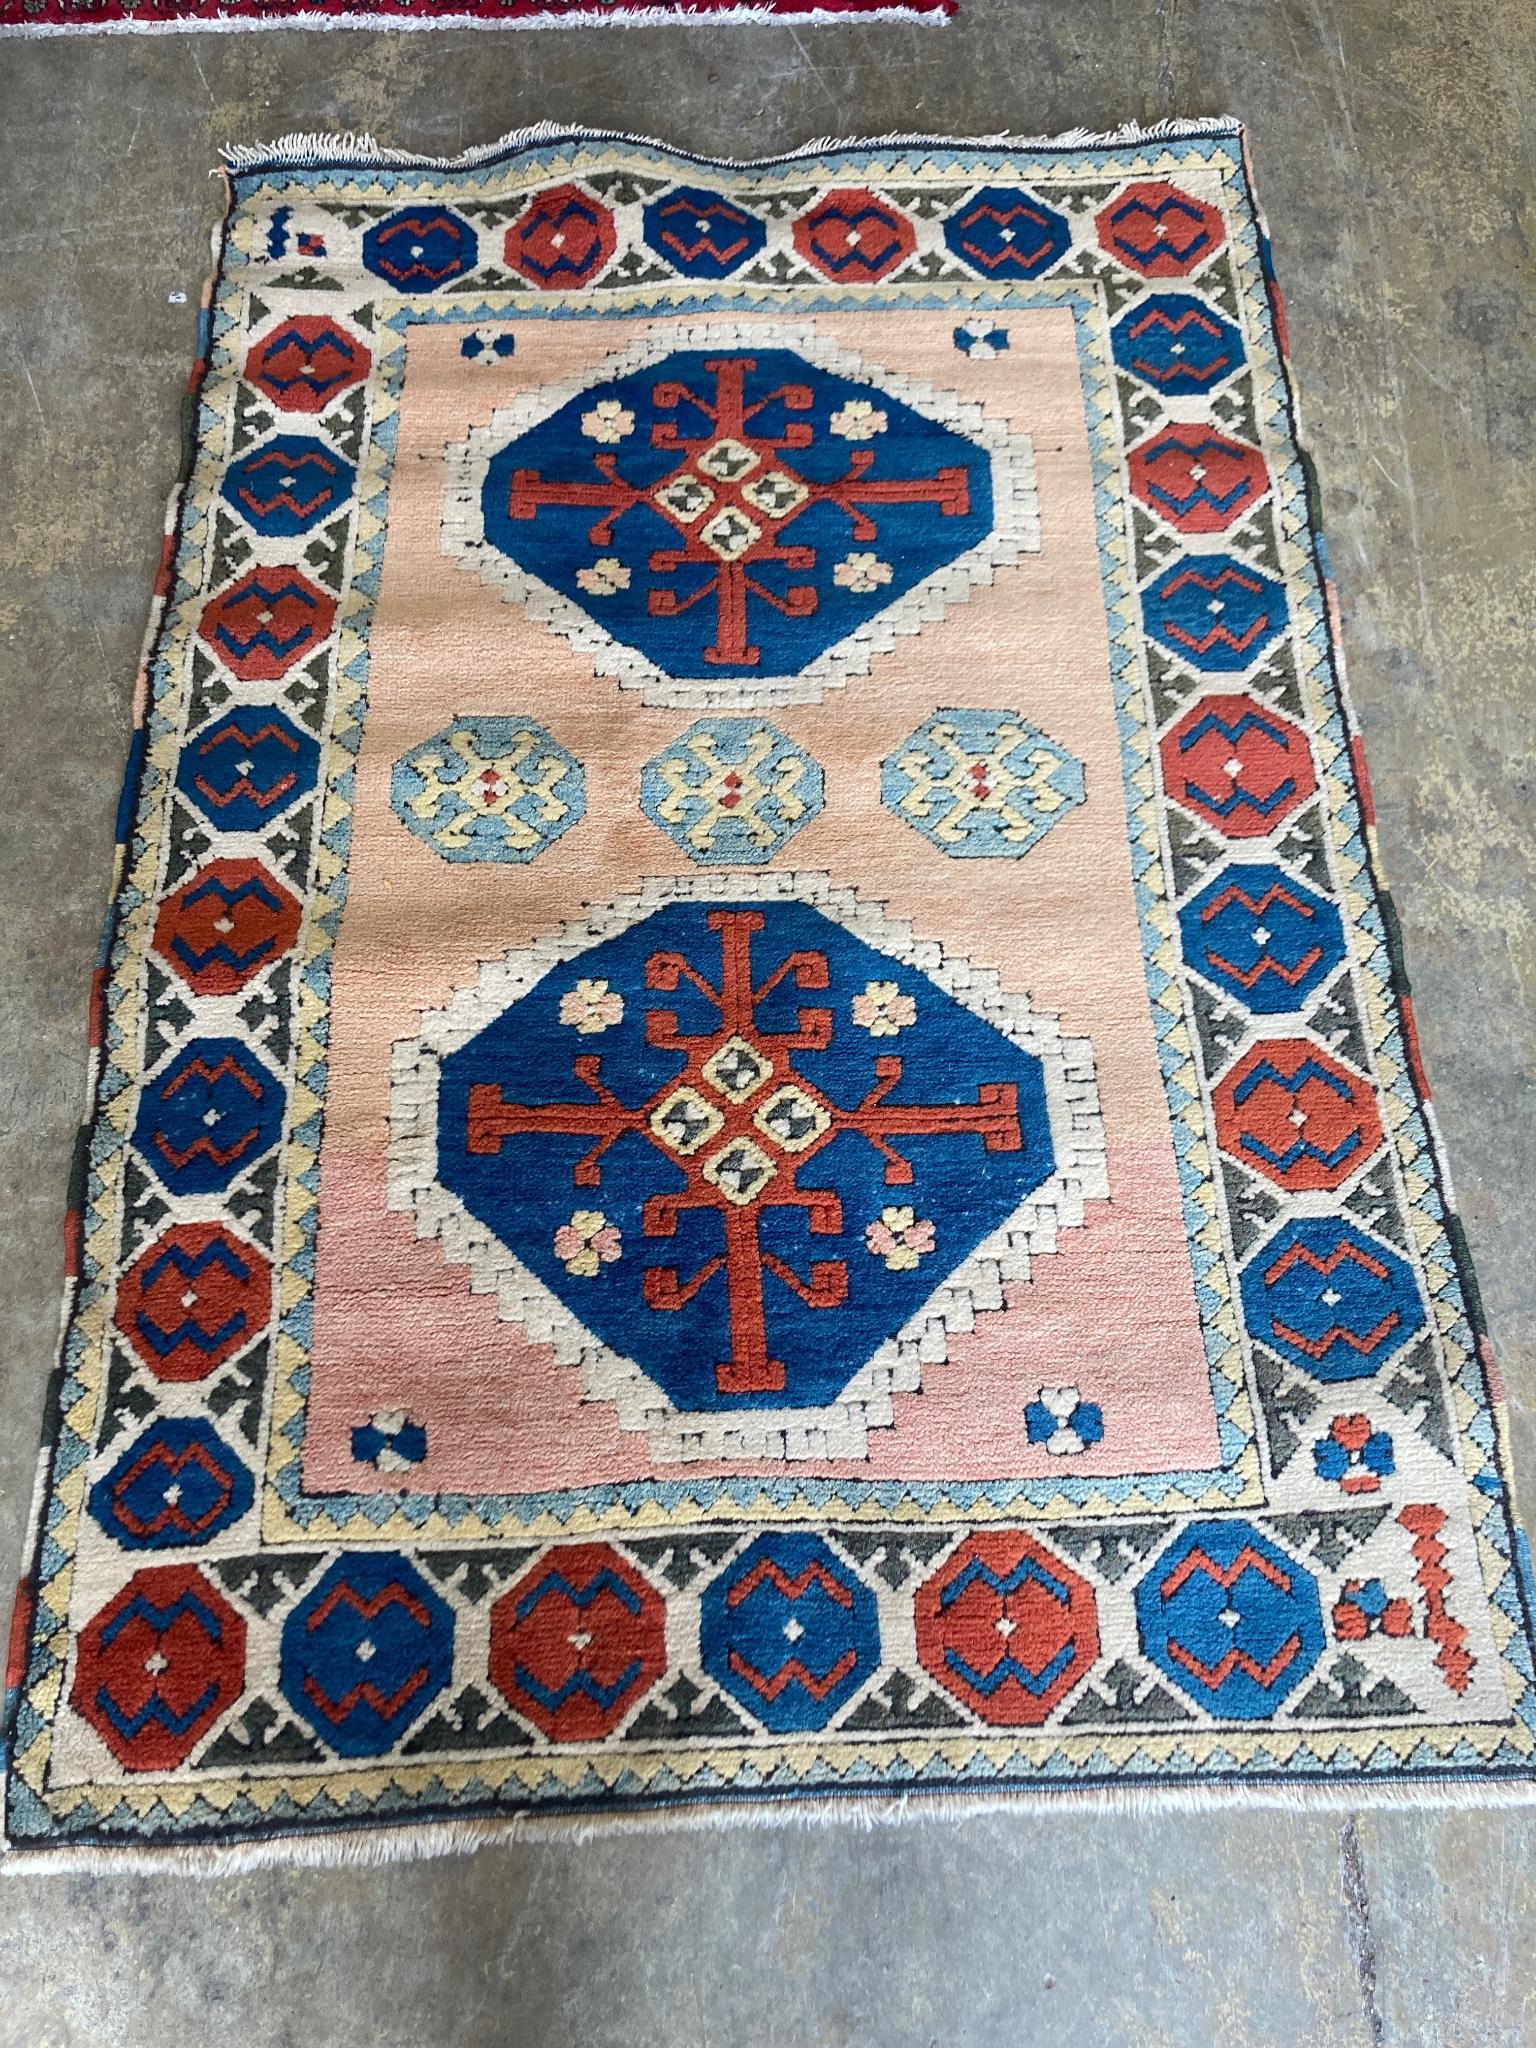 A Kazak style peach ground rug, 180 x 126cm